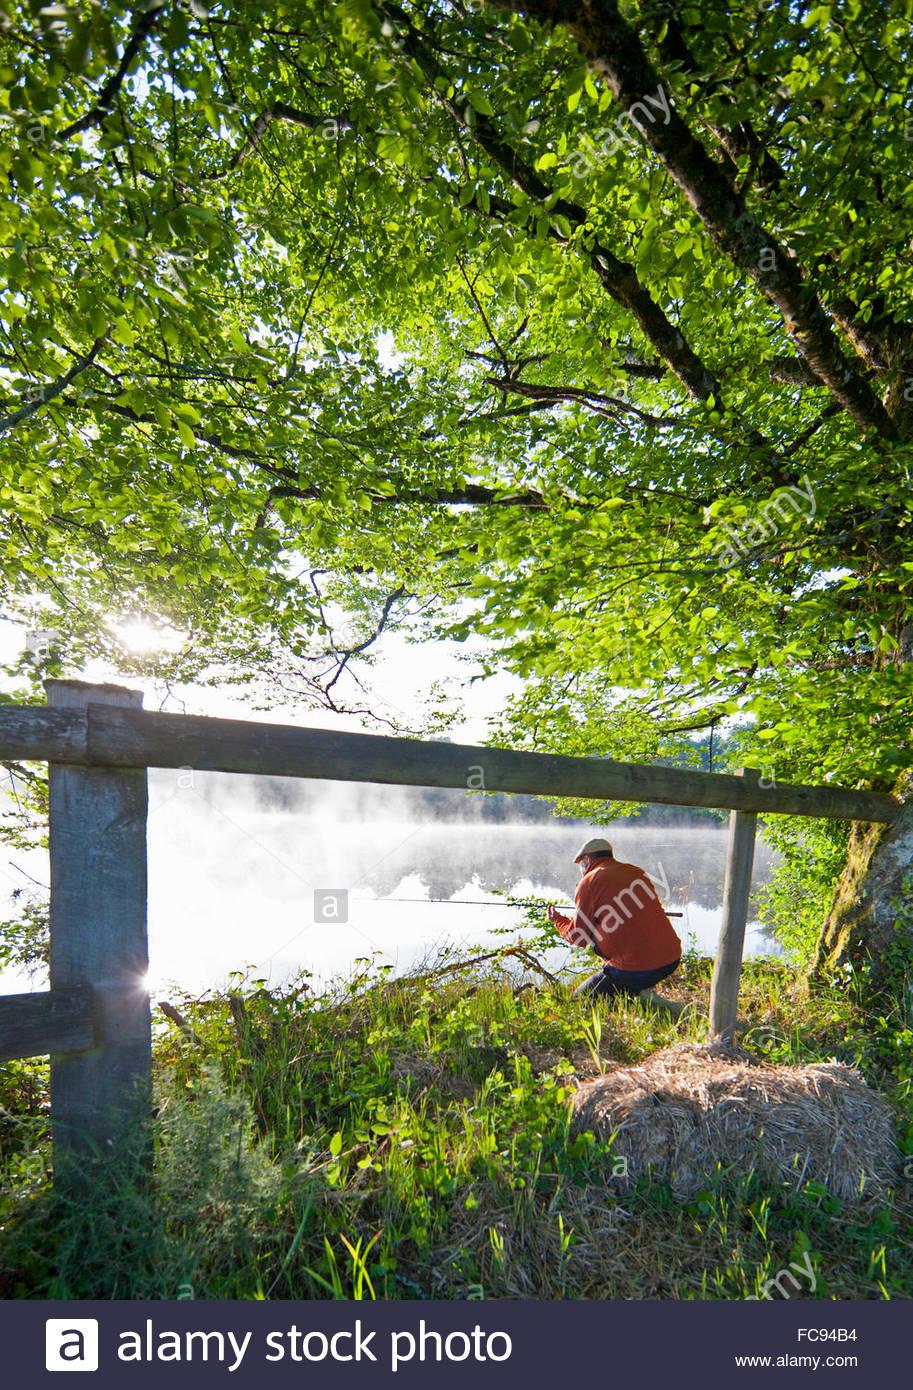 Fisherman carp fishing at lakeside beyond green trees and fence - Stock Image